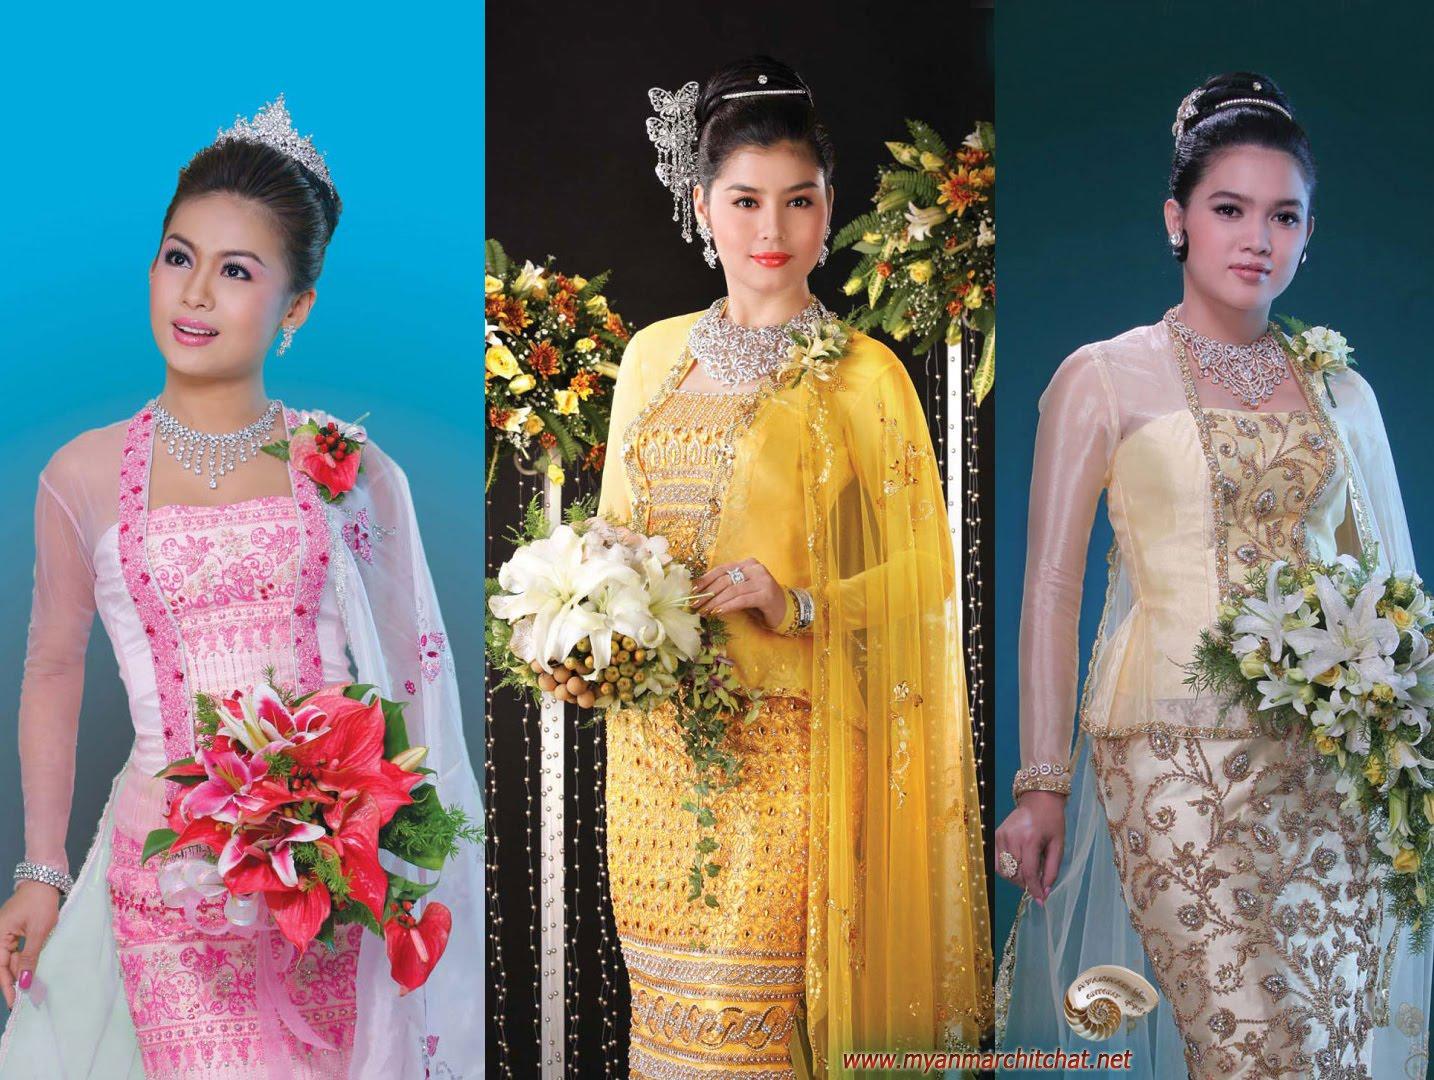 Myanmar Sexy Girls April 2011-9144